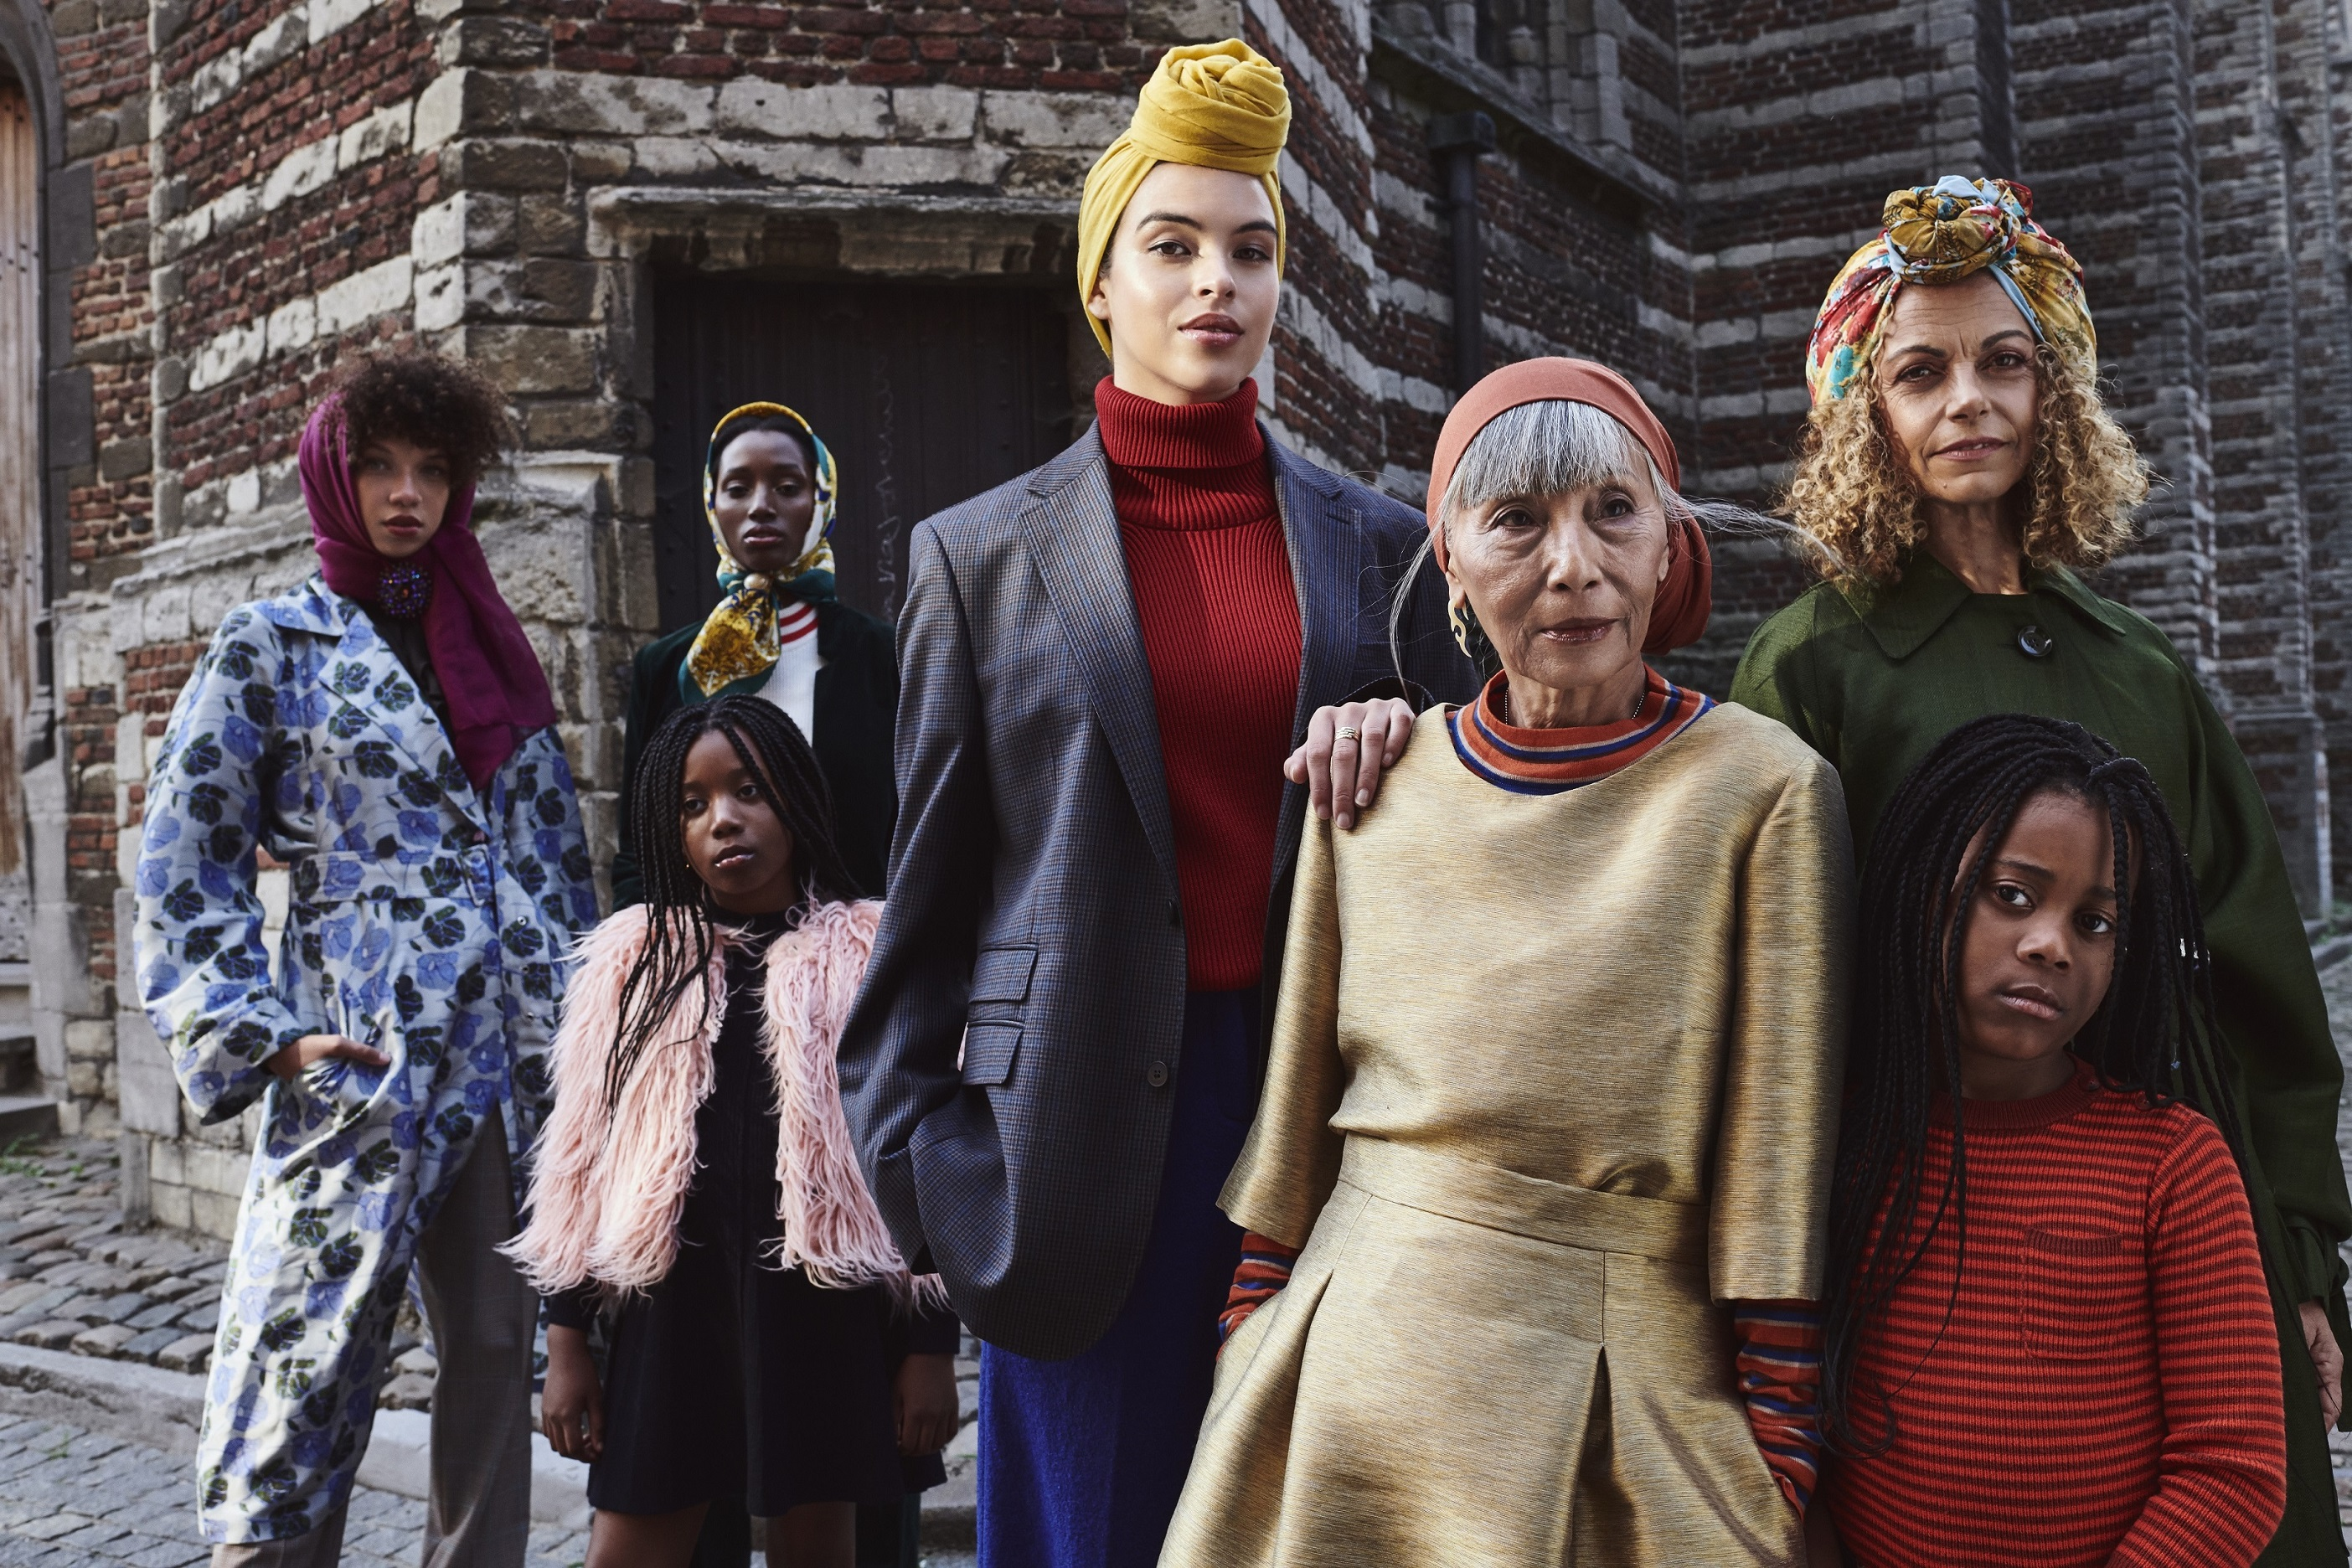 Modest Fashion Team - National Fashion League Hungary